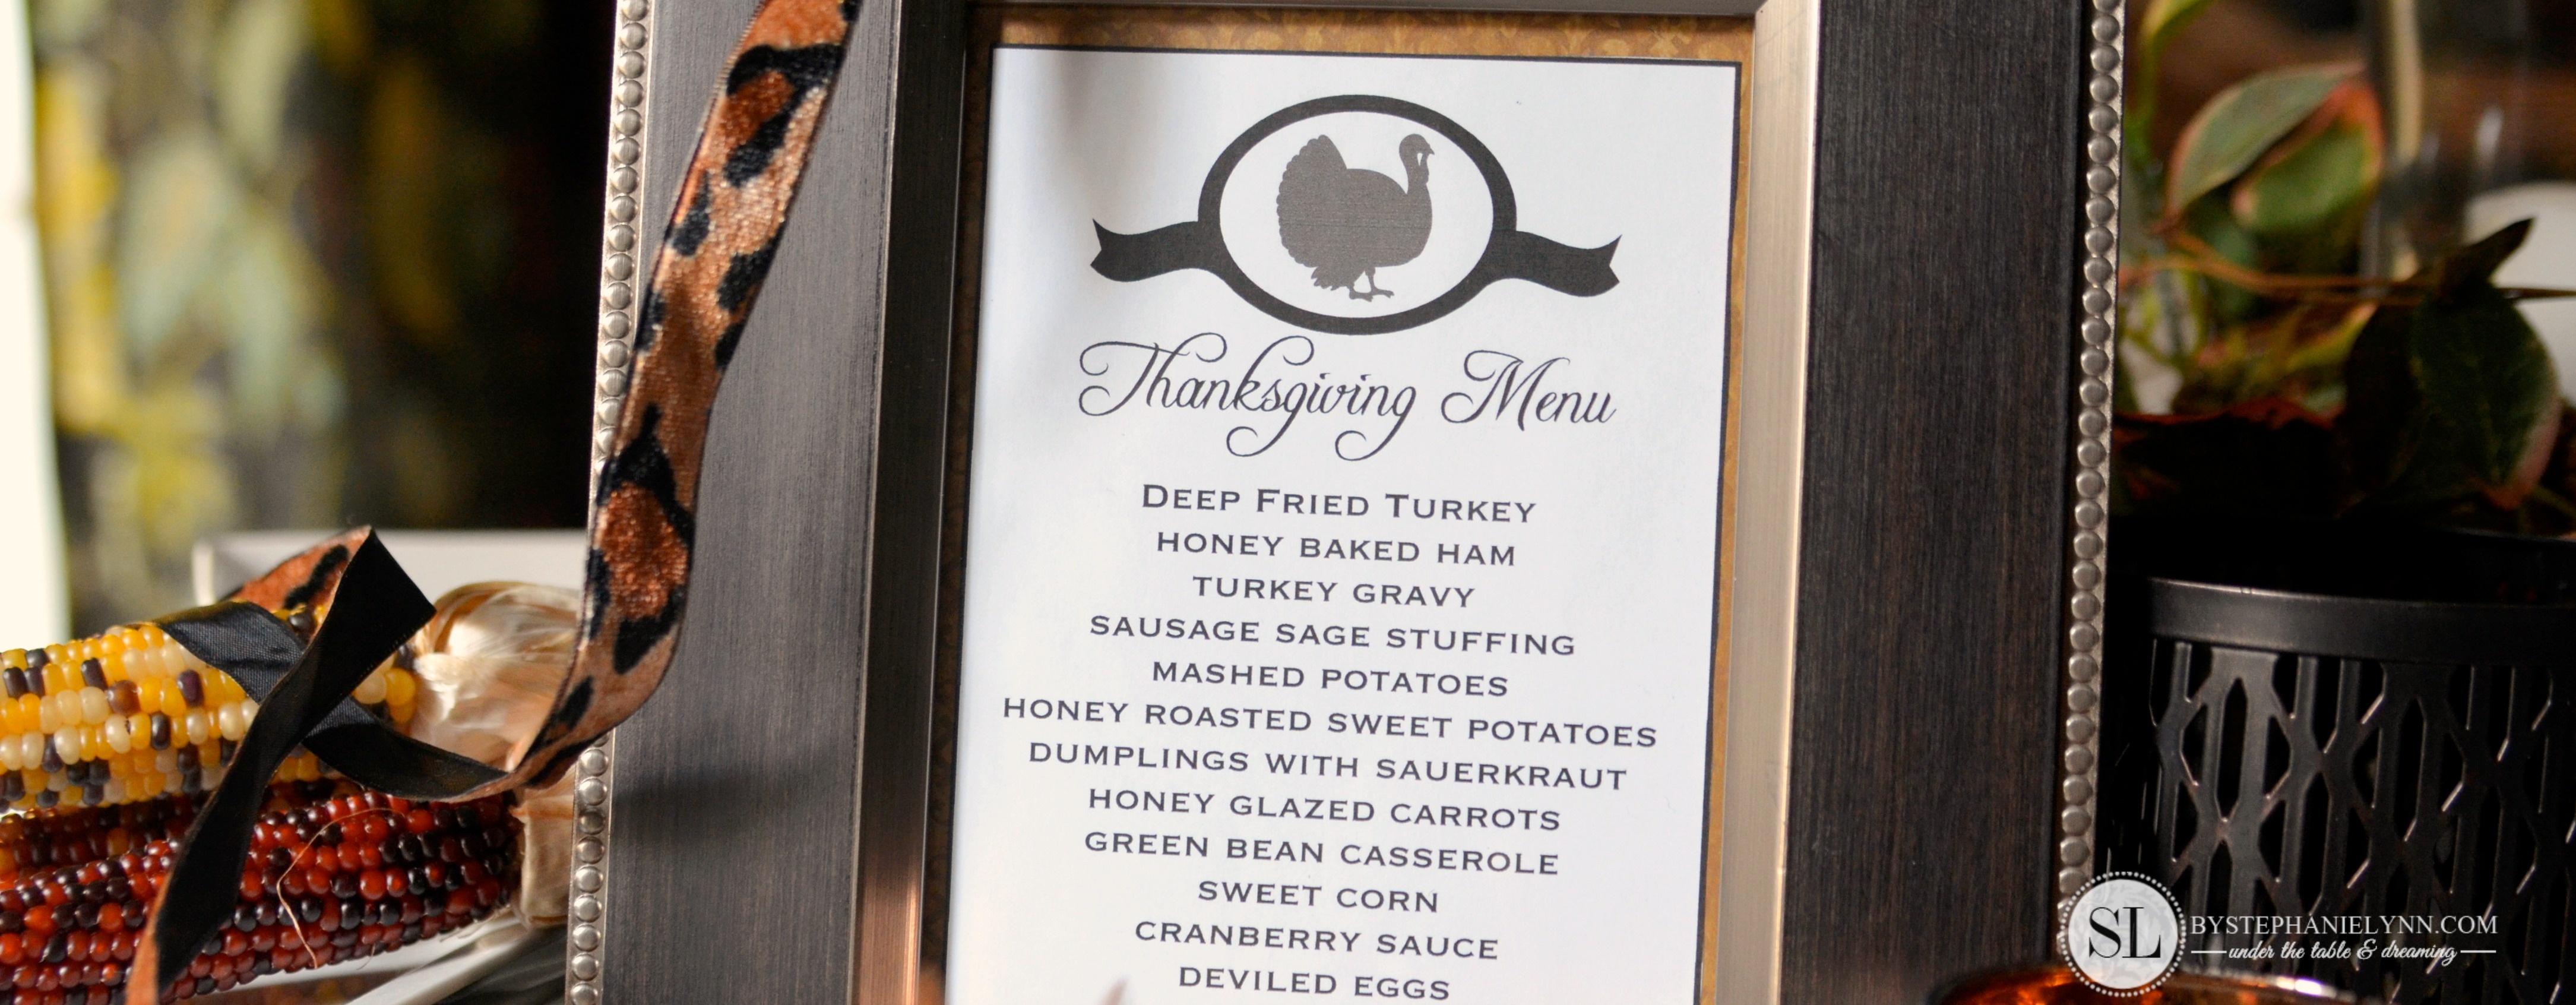 Printable Thanksgiving Menu Template | Making Printables With The - Free Printable Thanksgiving Menu Template